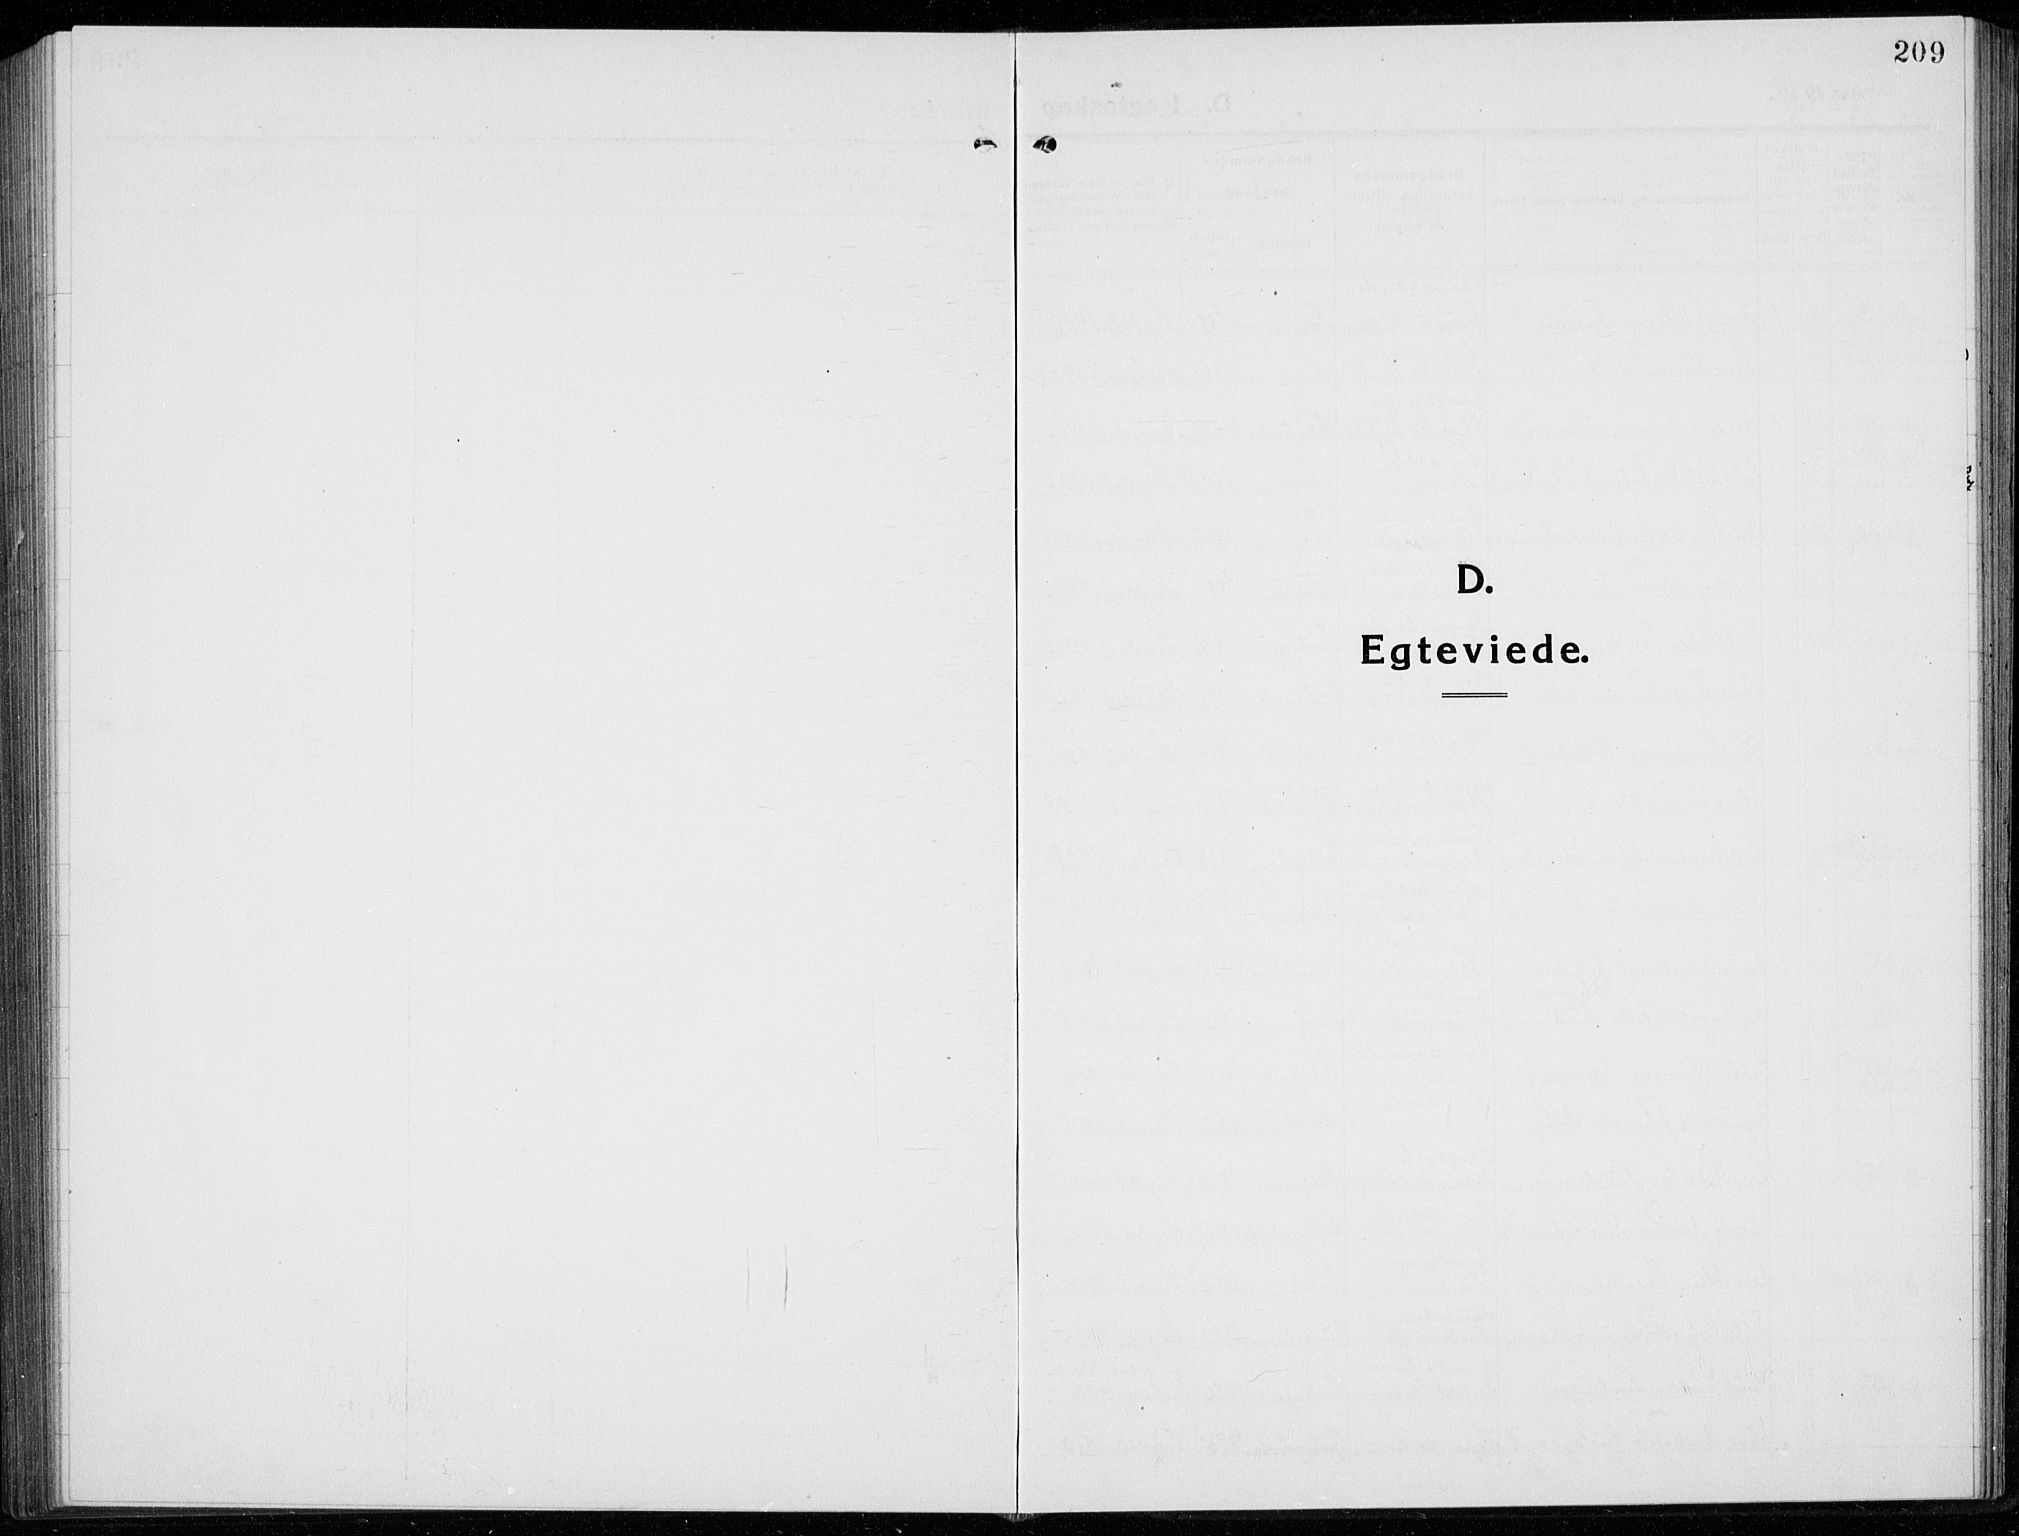 SAKO, Sigdal kirkebøker, G/Ga/L0007: Klokkerbok nr. I 7, 1917-1935, s. 209